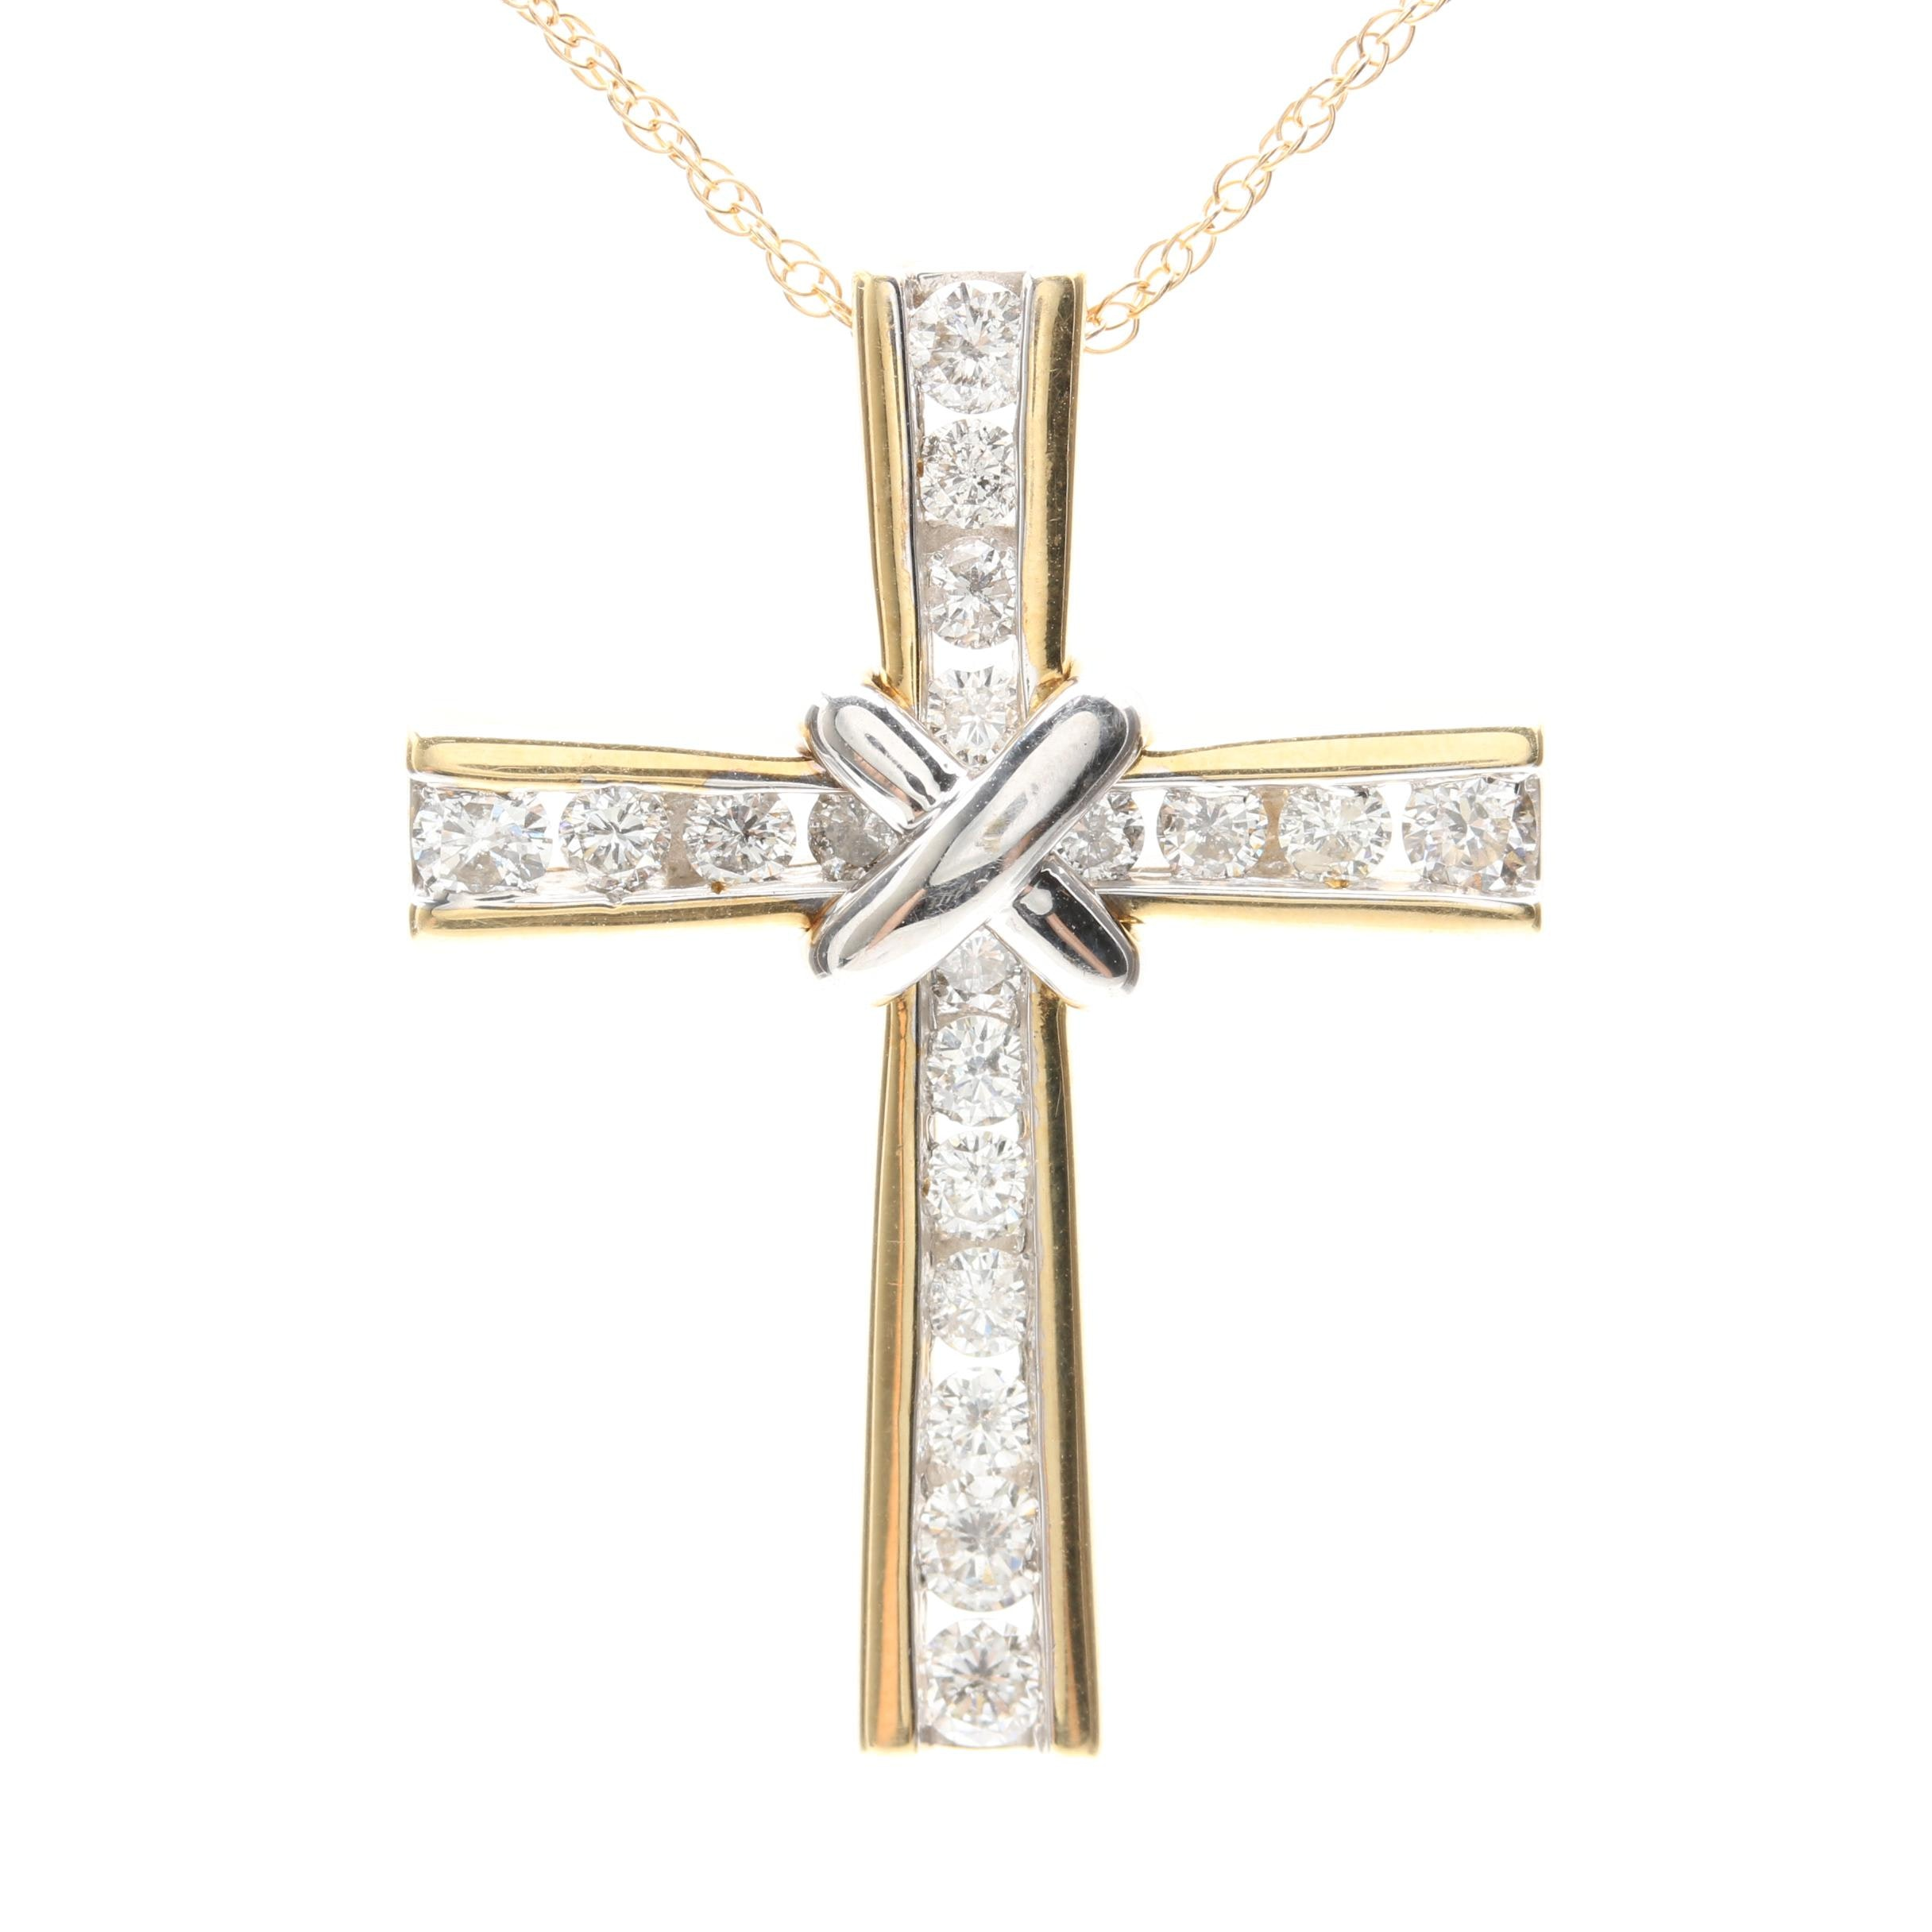 14K Yellow Gold 1.04 CTW Diamond Cross Pendant Necklace